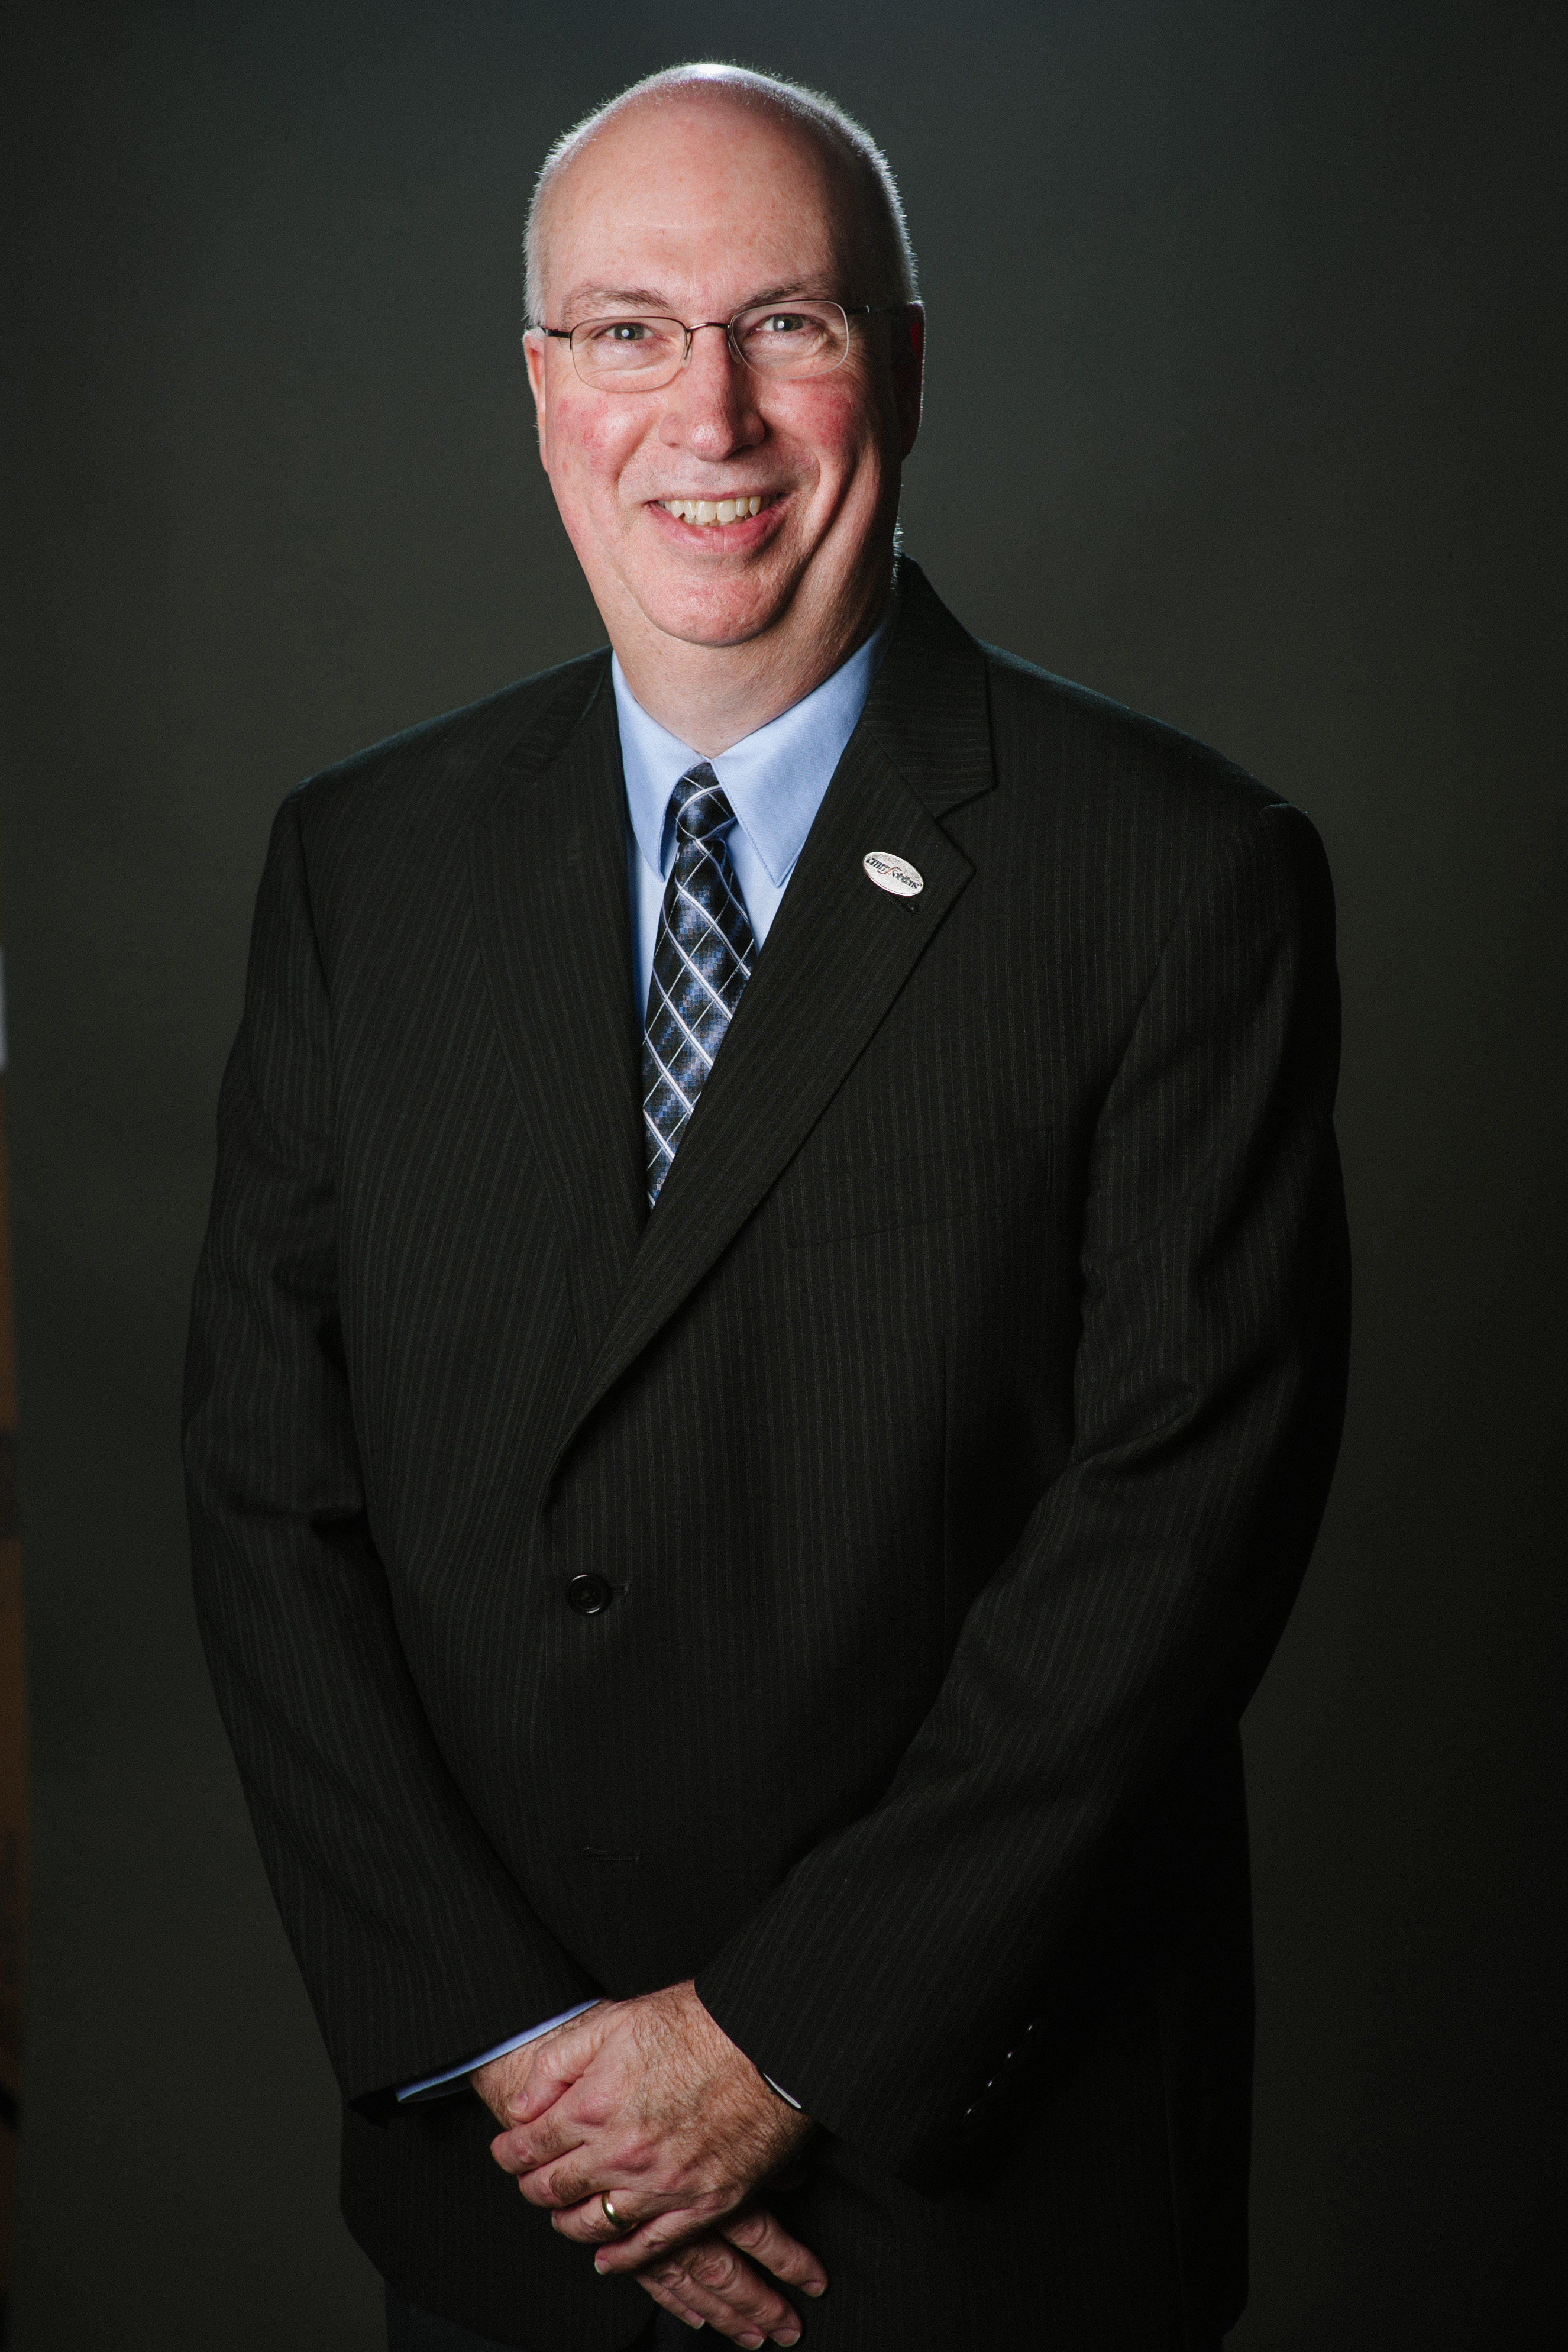 Tom Burtzlaff